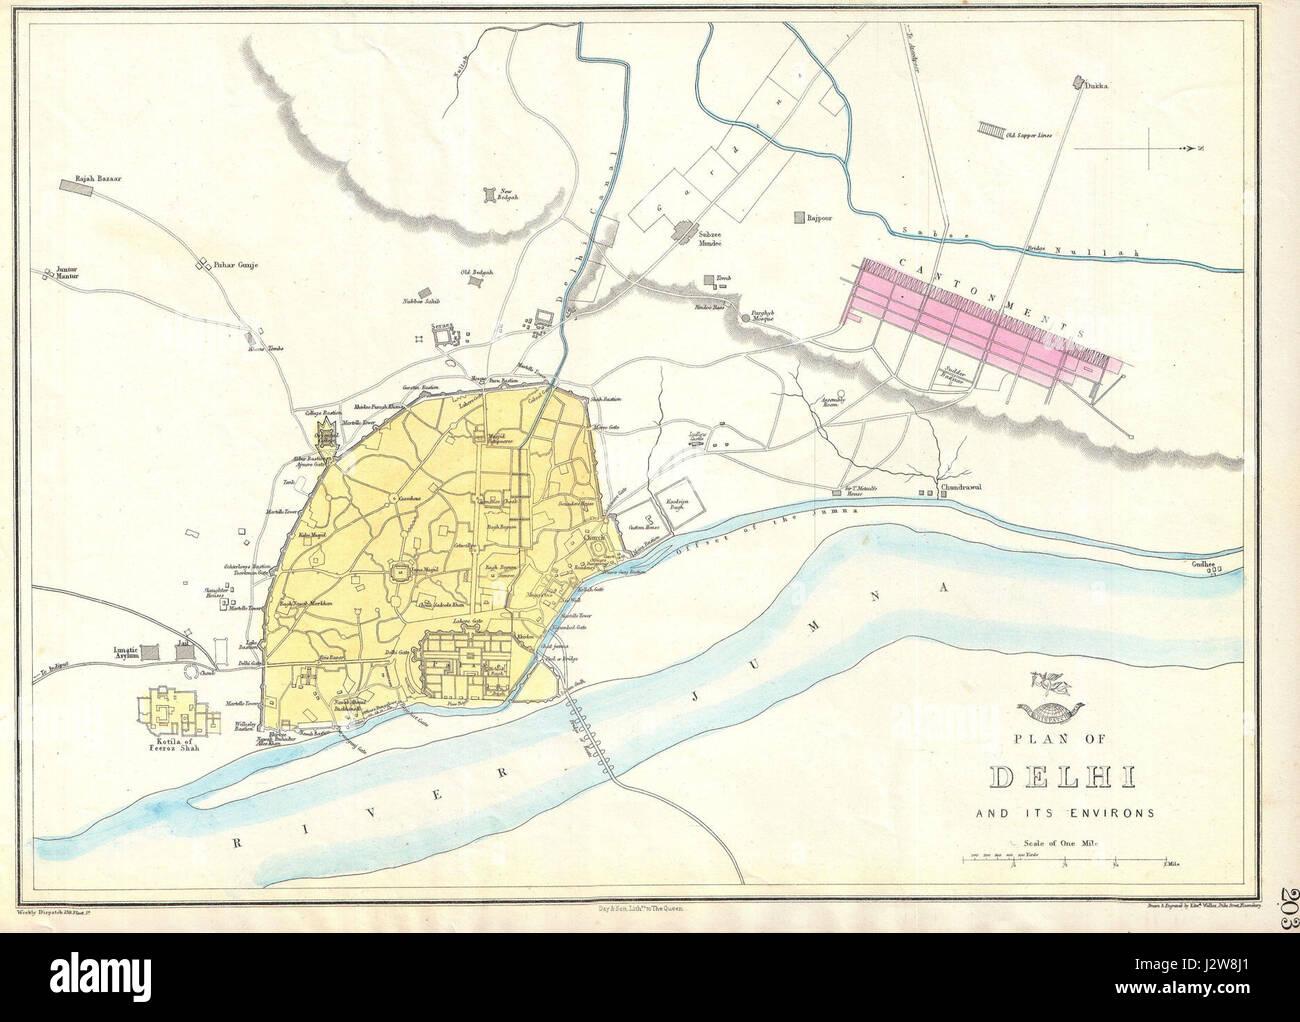 Map of delhi stock photos map of delhi stock images alamy 1863 dispatch atlas map of delhi india geographicus delhi dispatch 1867 gumiabroncs Gallery